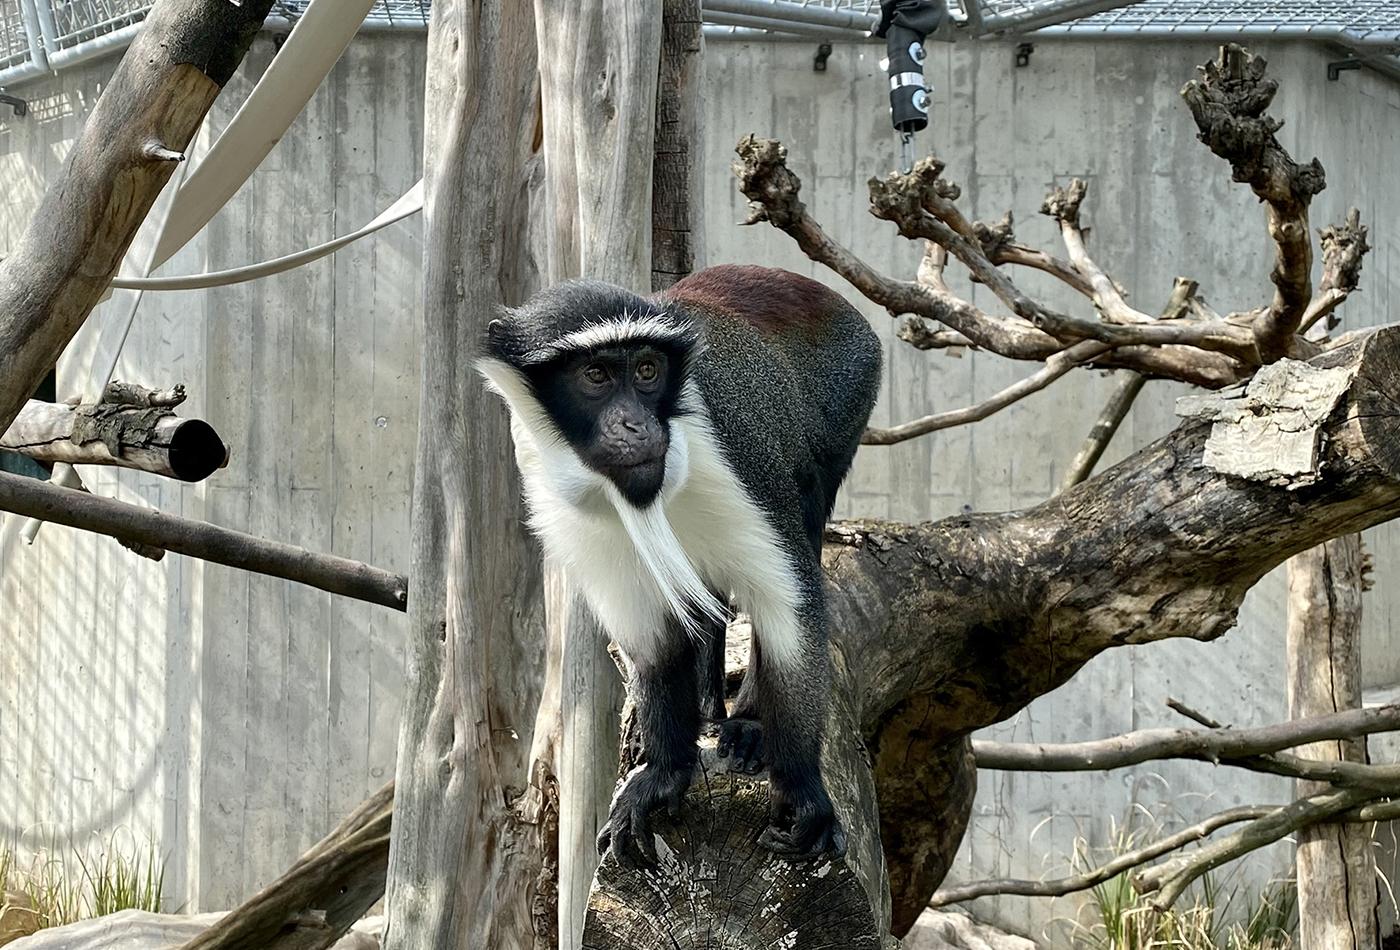 Roloway-Meerkatze im neuen Außengehege (Foto: Zoo Heidelberg)